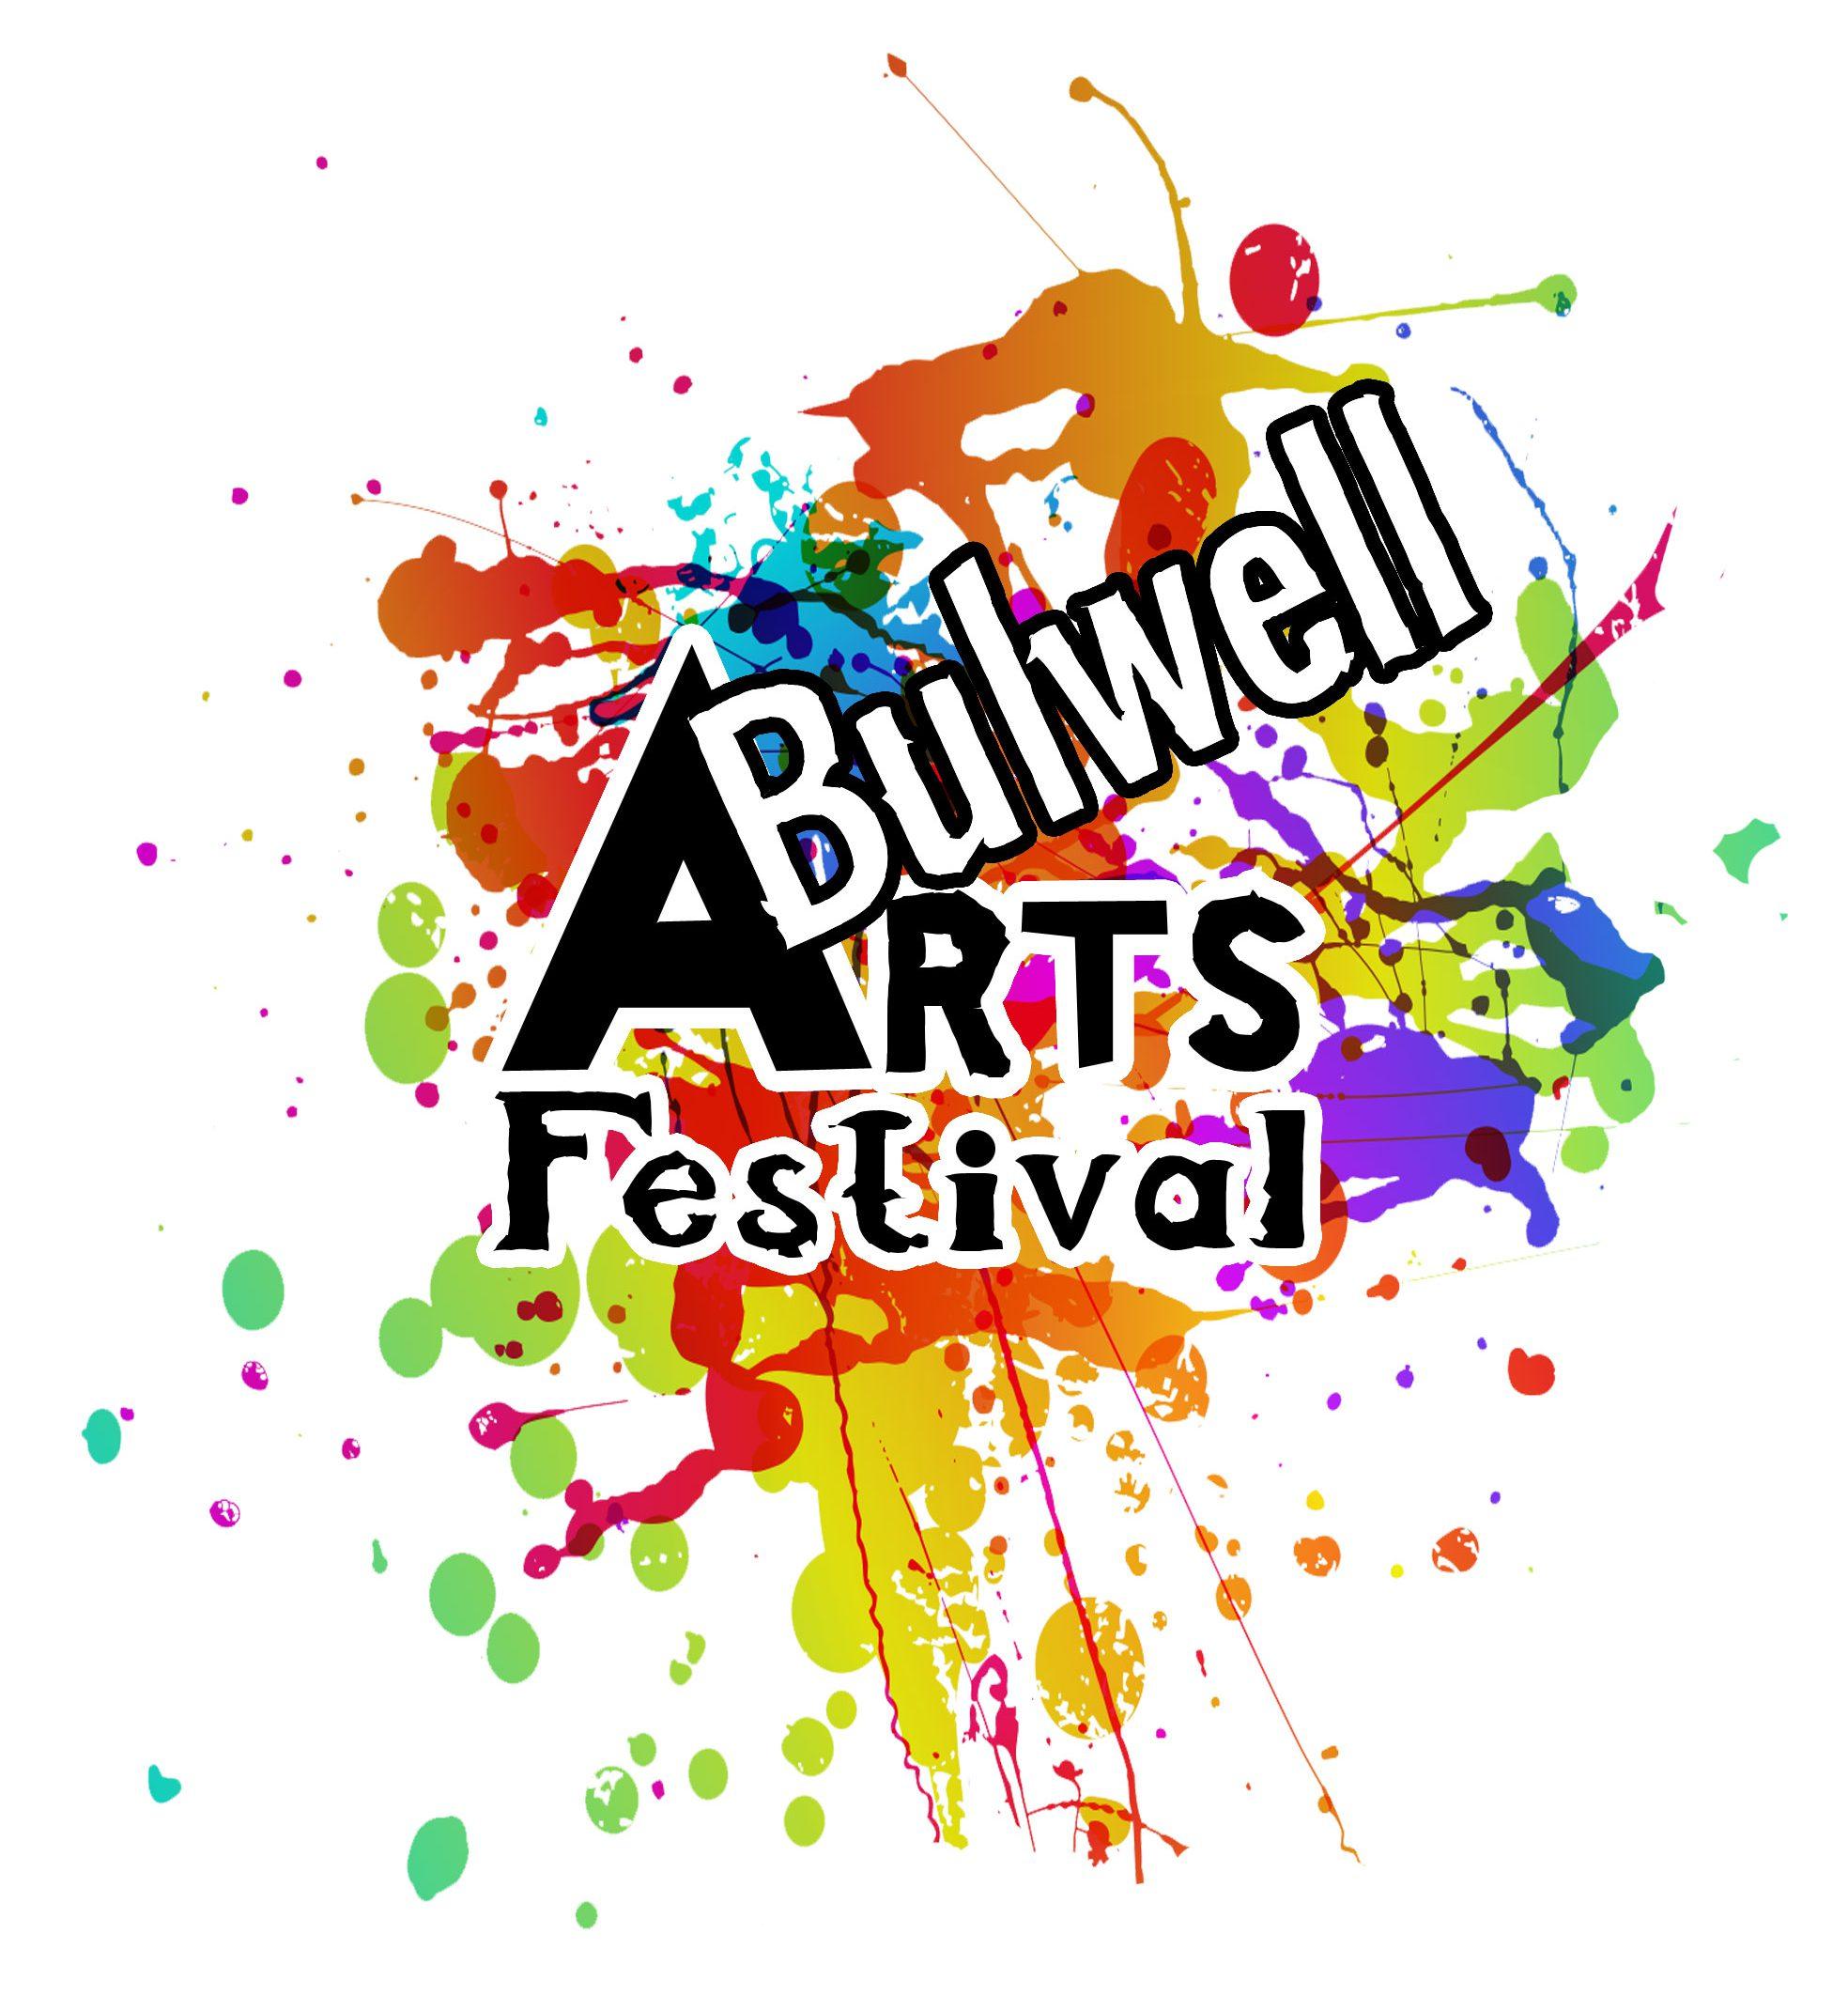 Bulwell Arts Festival 2020